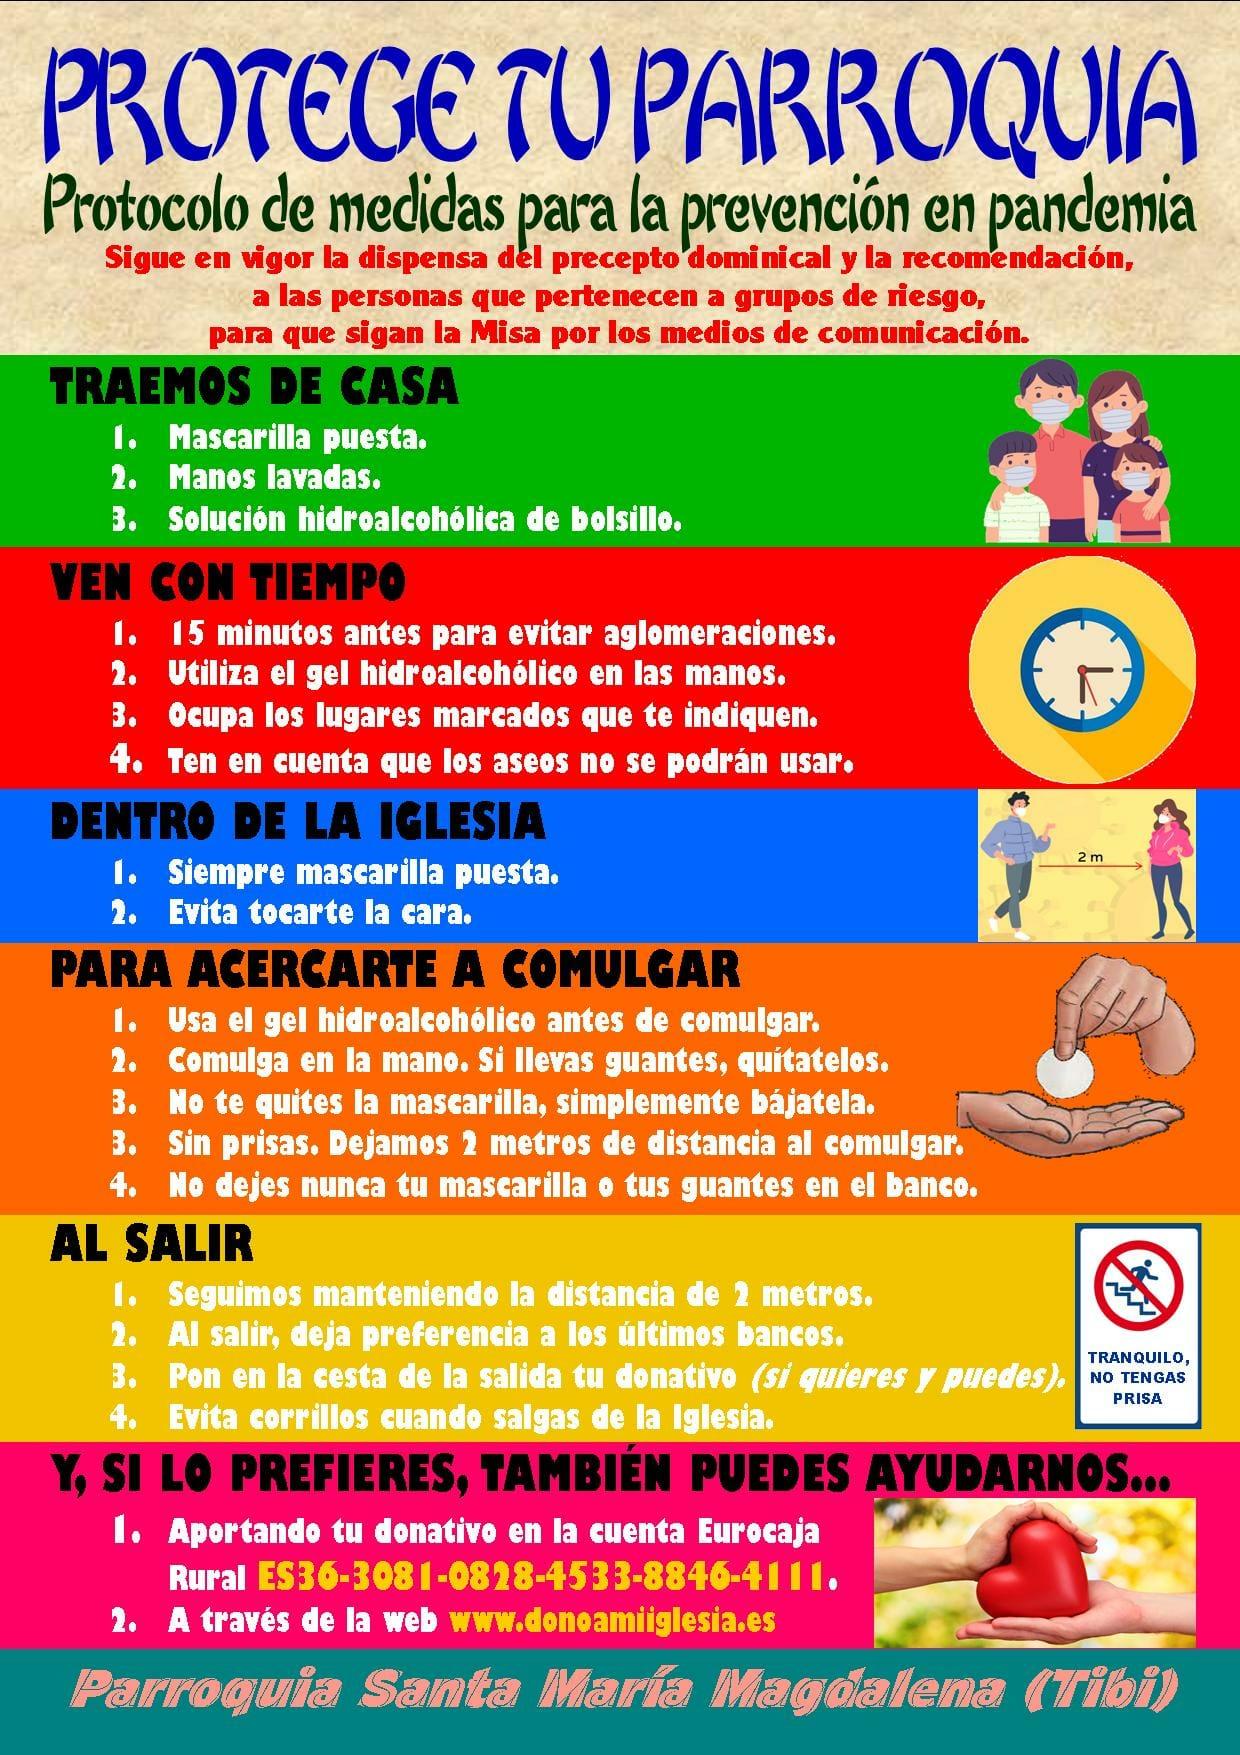 Protocolo de medidas de prevención - Iglesia Santa María Magdalena